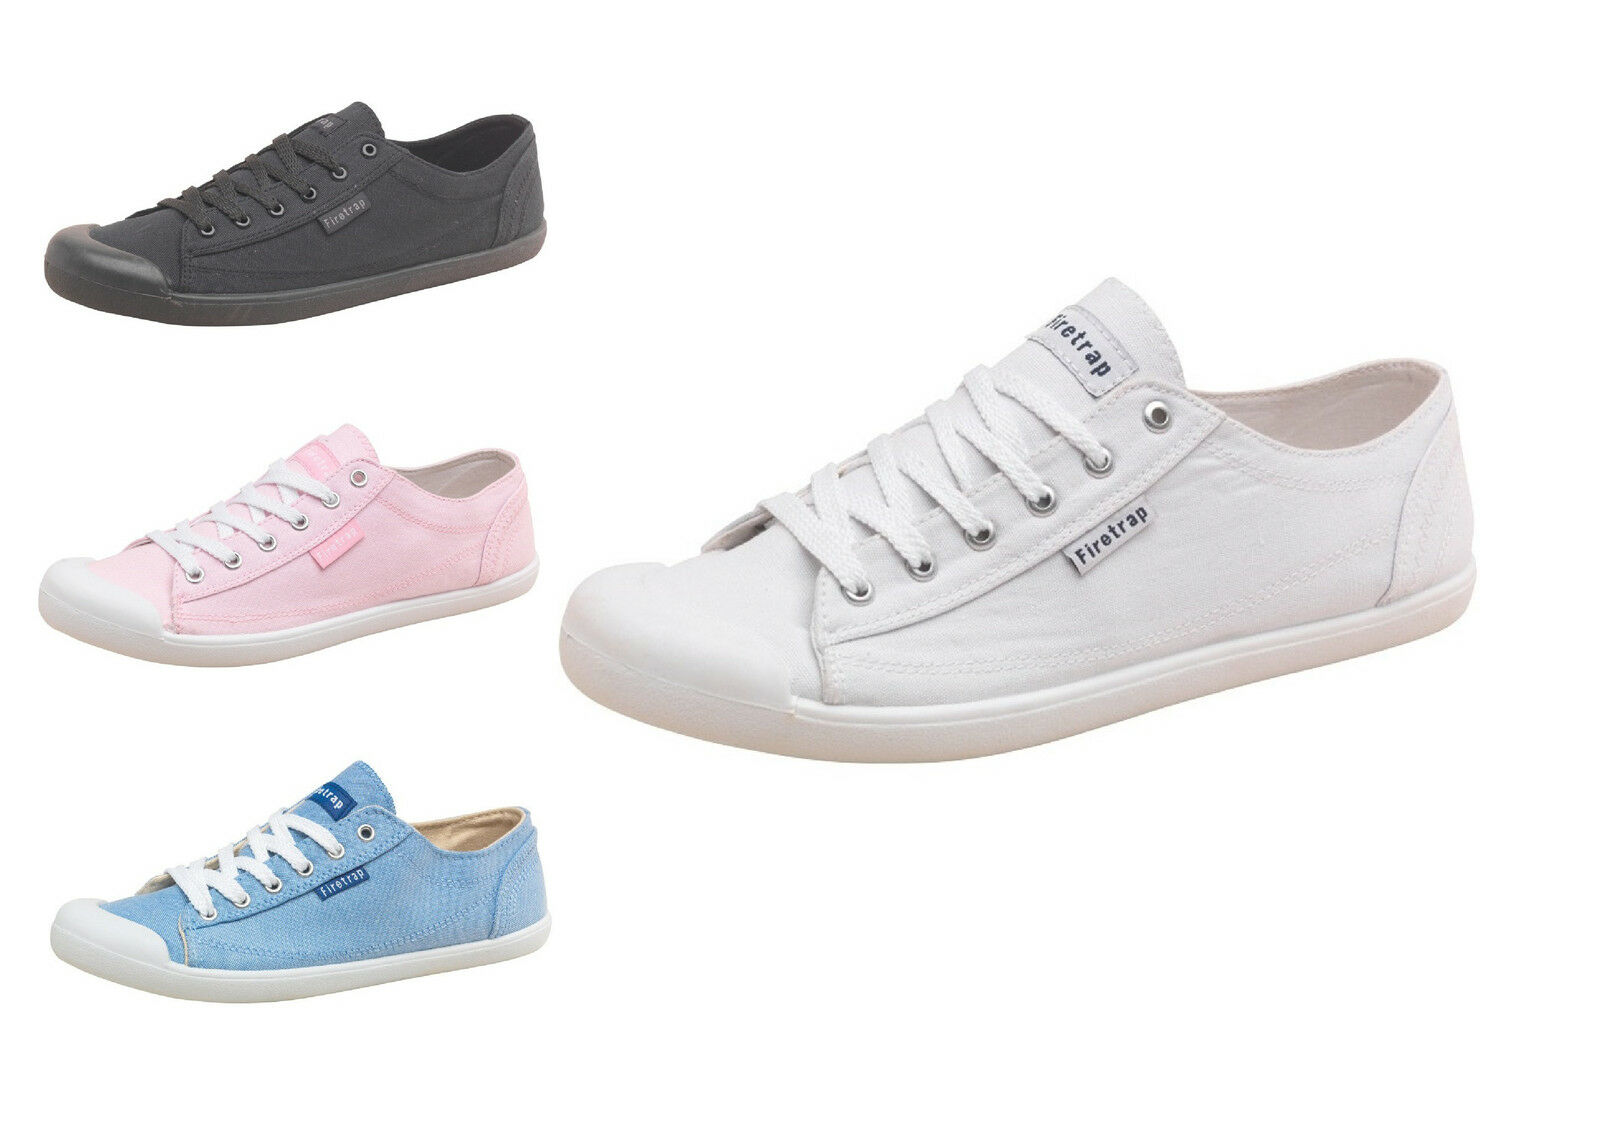 Firetrap Womens Plimsolls, Shoes, Womens Firetrap Canvas Shoes, Plimsolls, Pumps Plimsolls-GENUINE c282a1